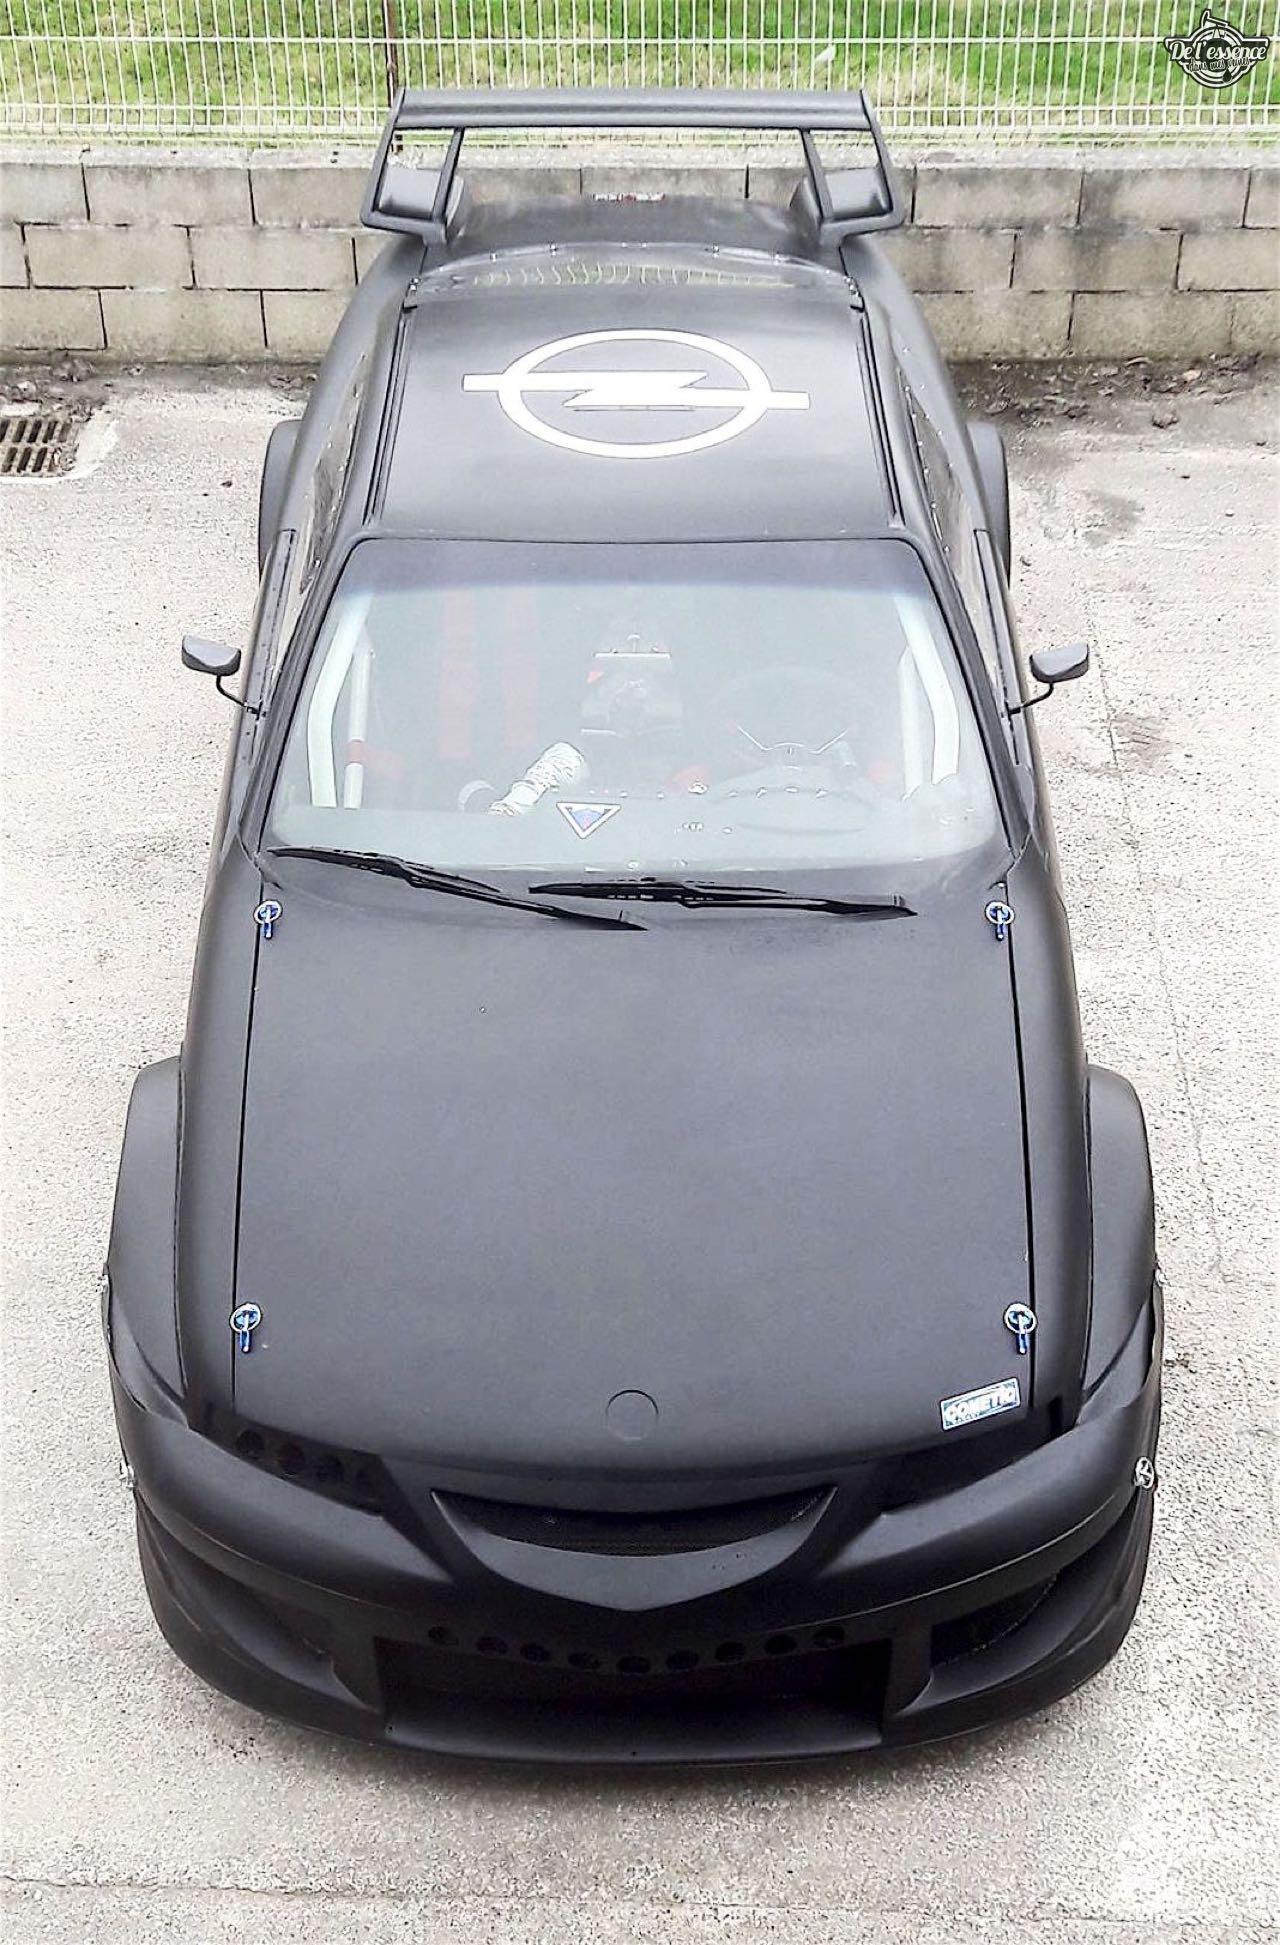 L'Opel Calibra Turbo de Gilles - En piste... 2